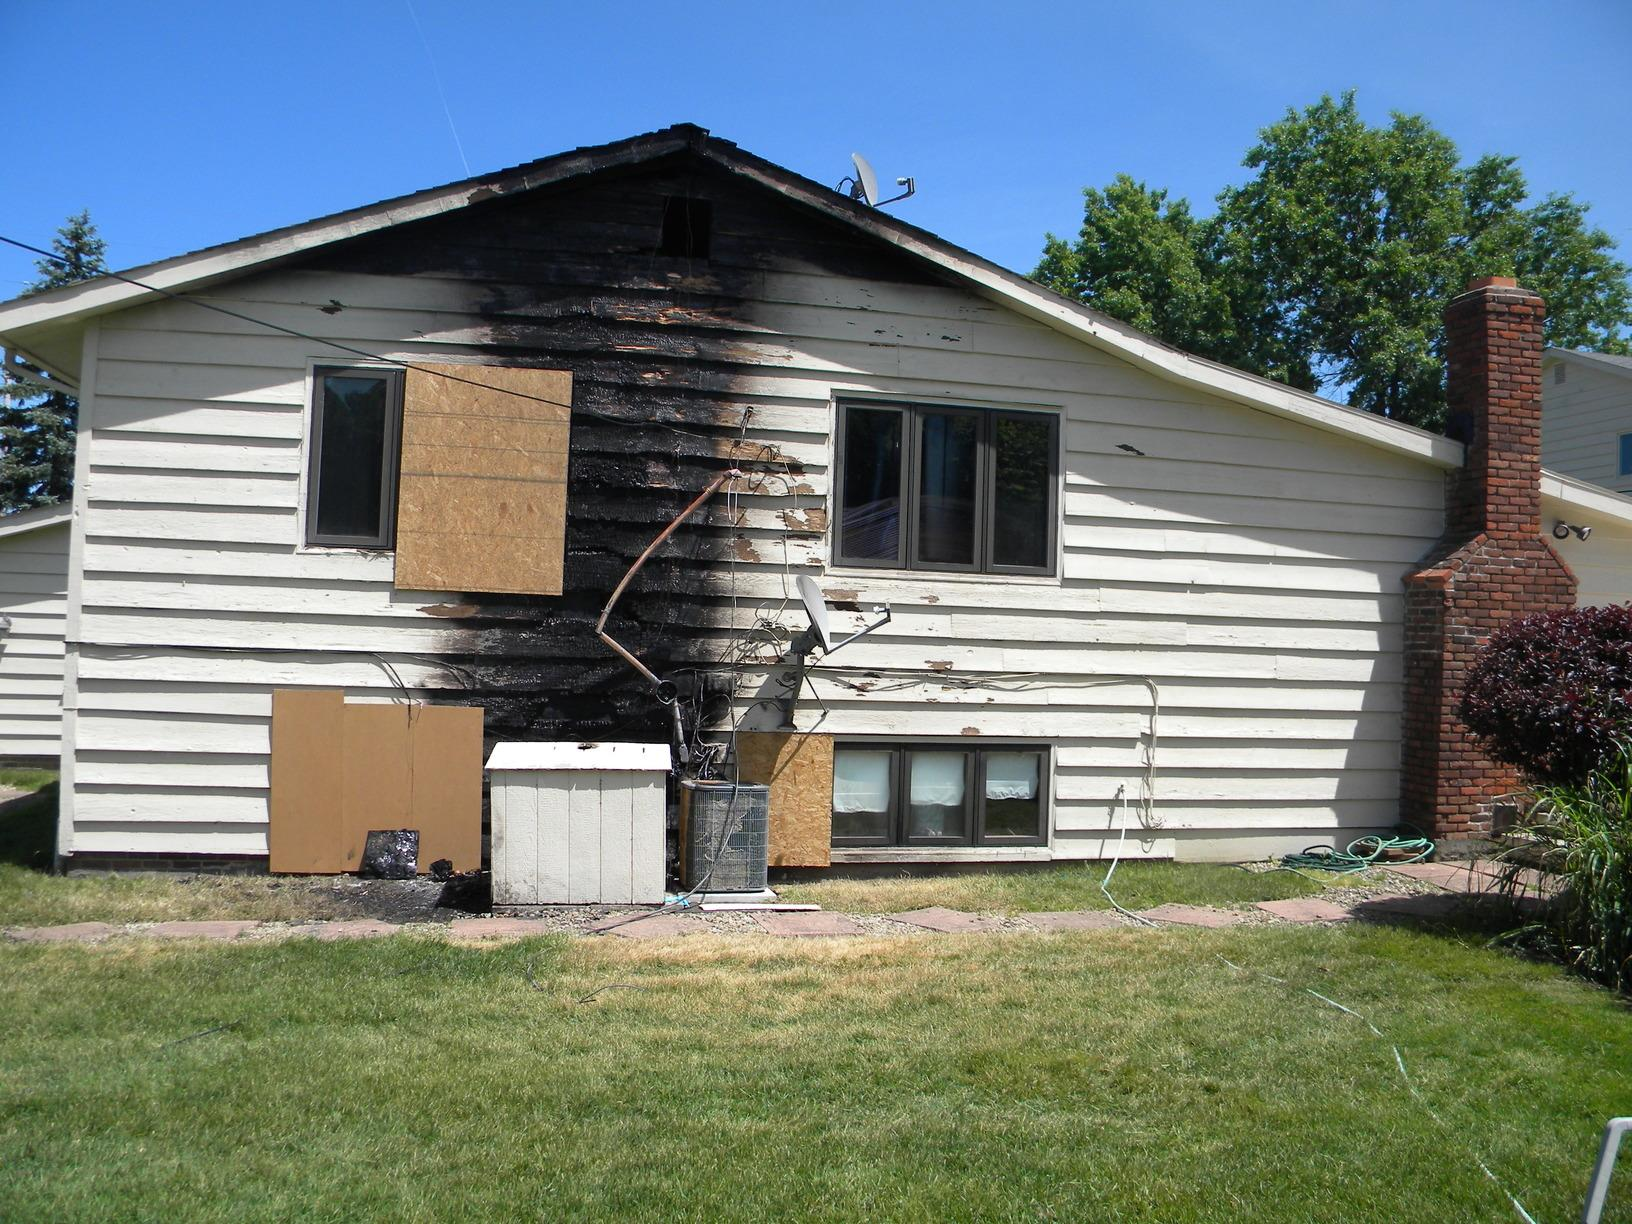 Fire damage from generator in Beachwood, Ohio - Before Photo